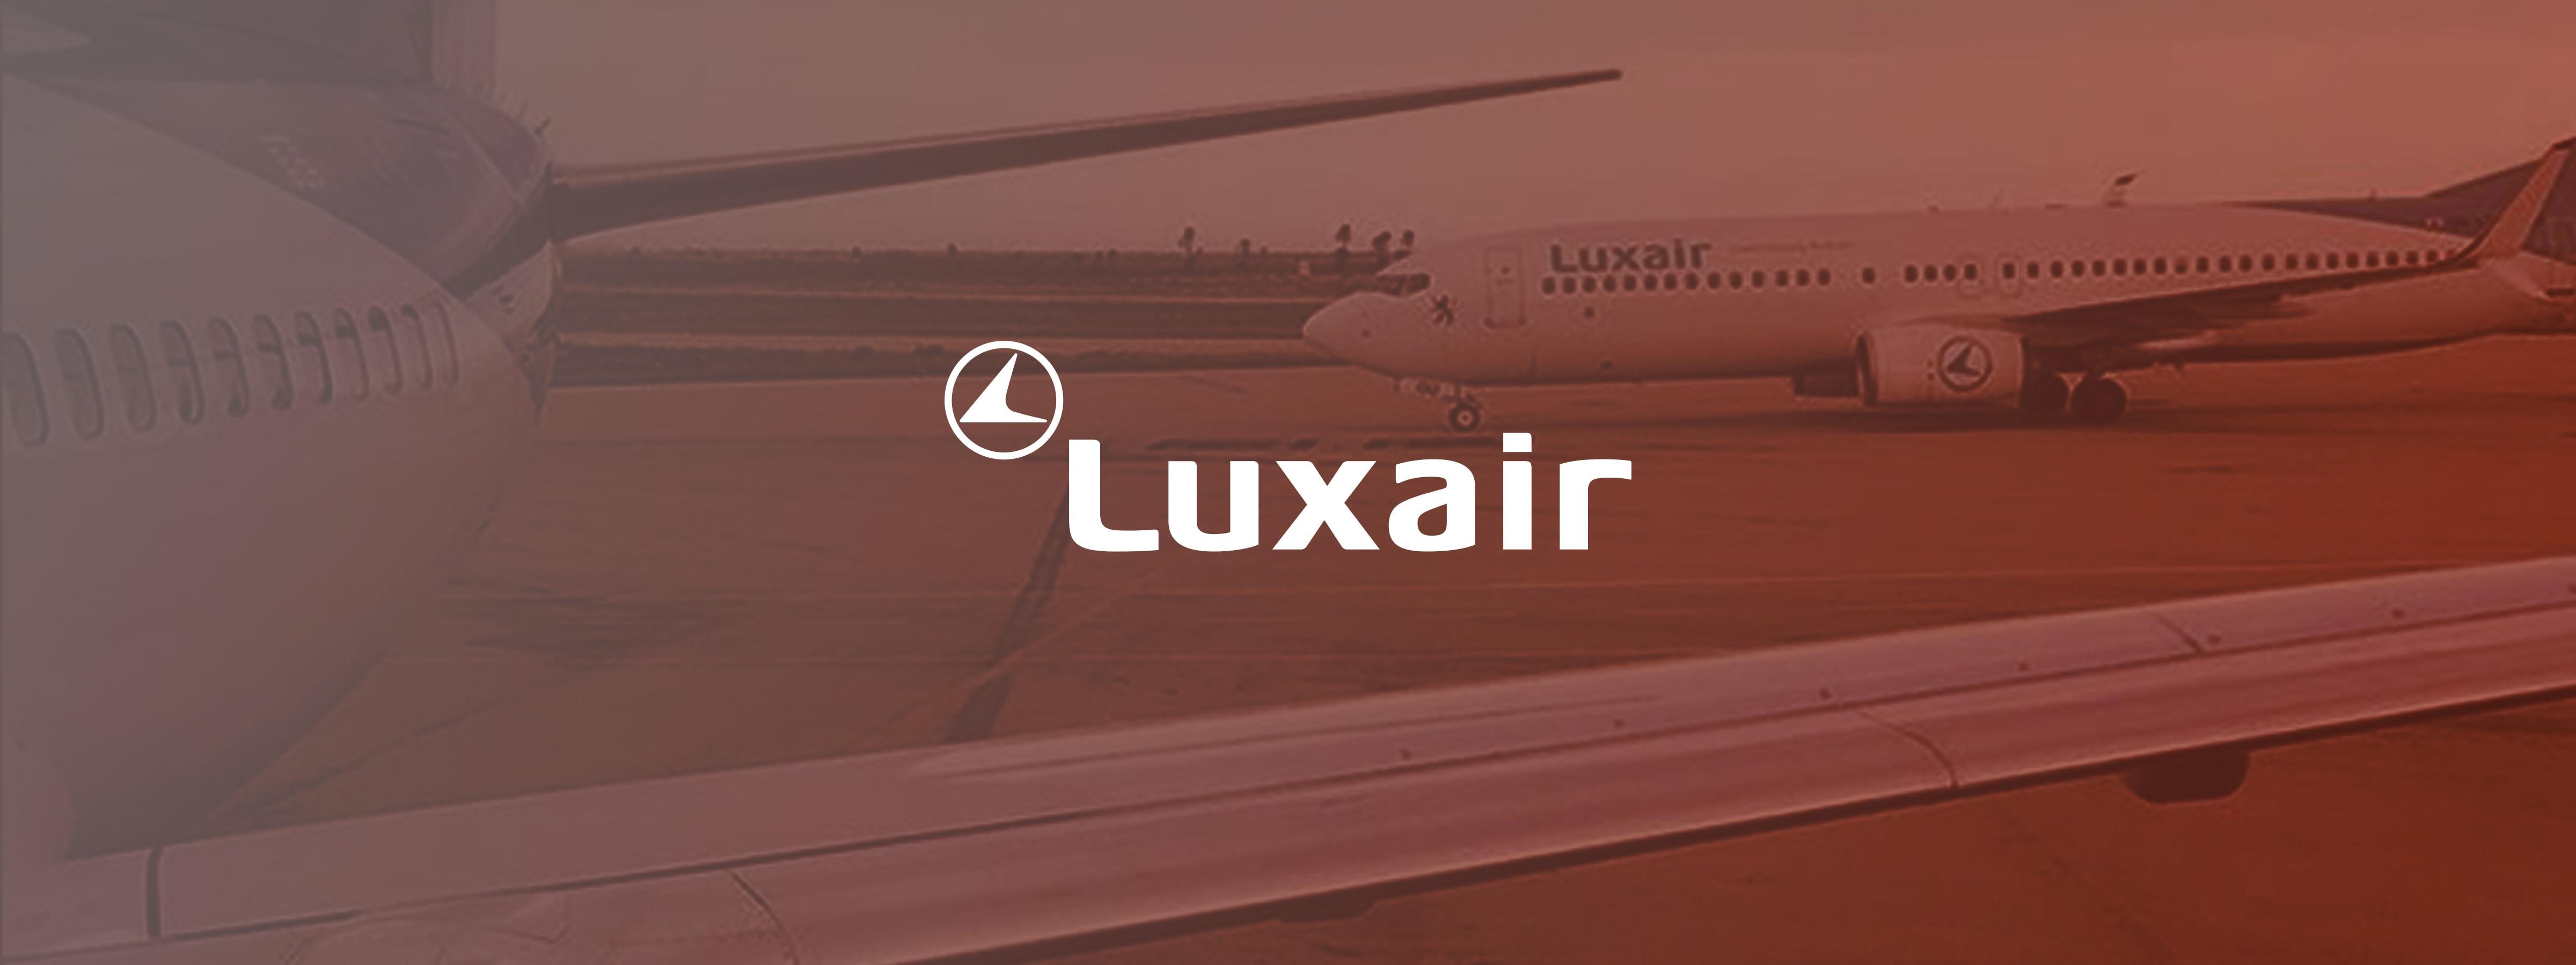 Luxair_CaseStudy_1-min